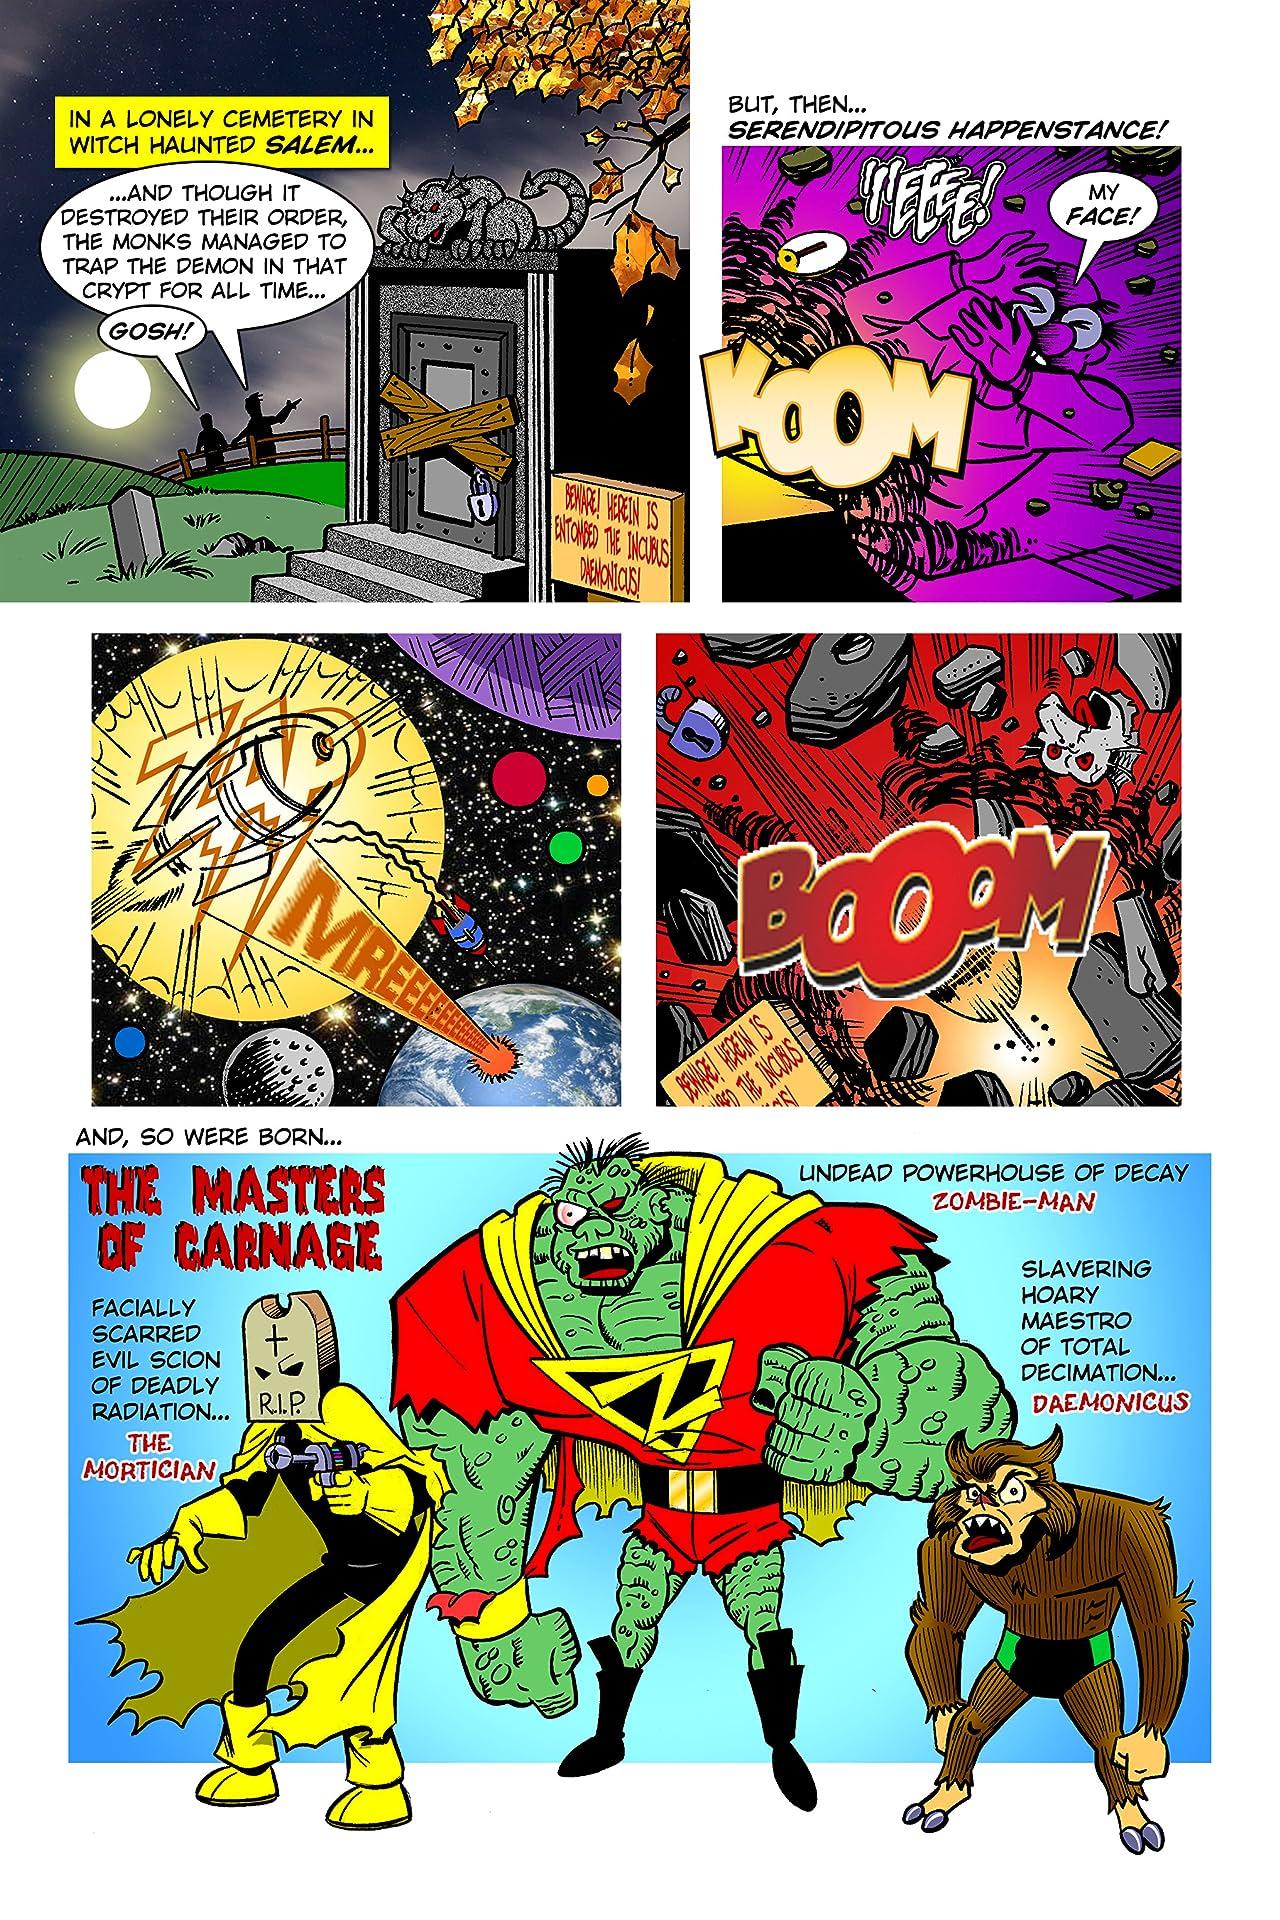 Holy Cow Comics #4